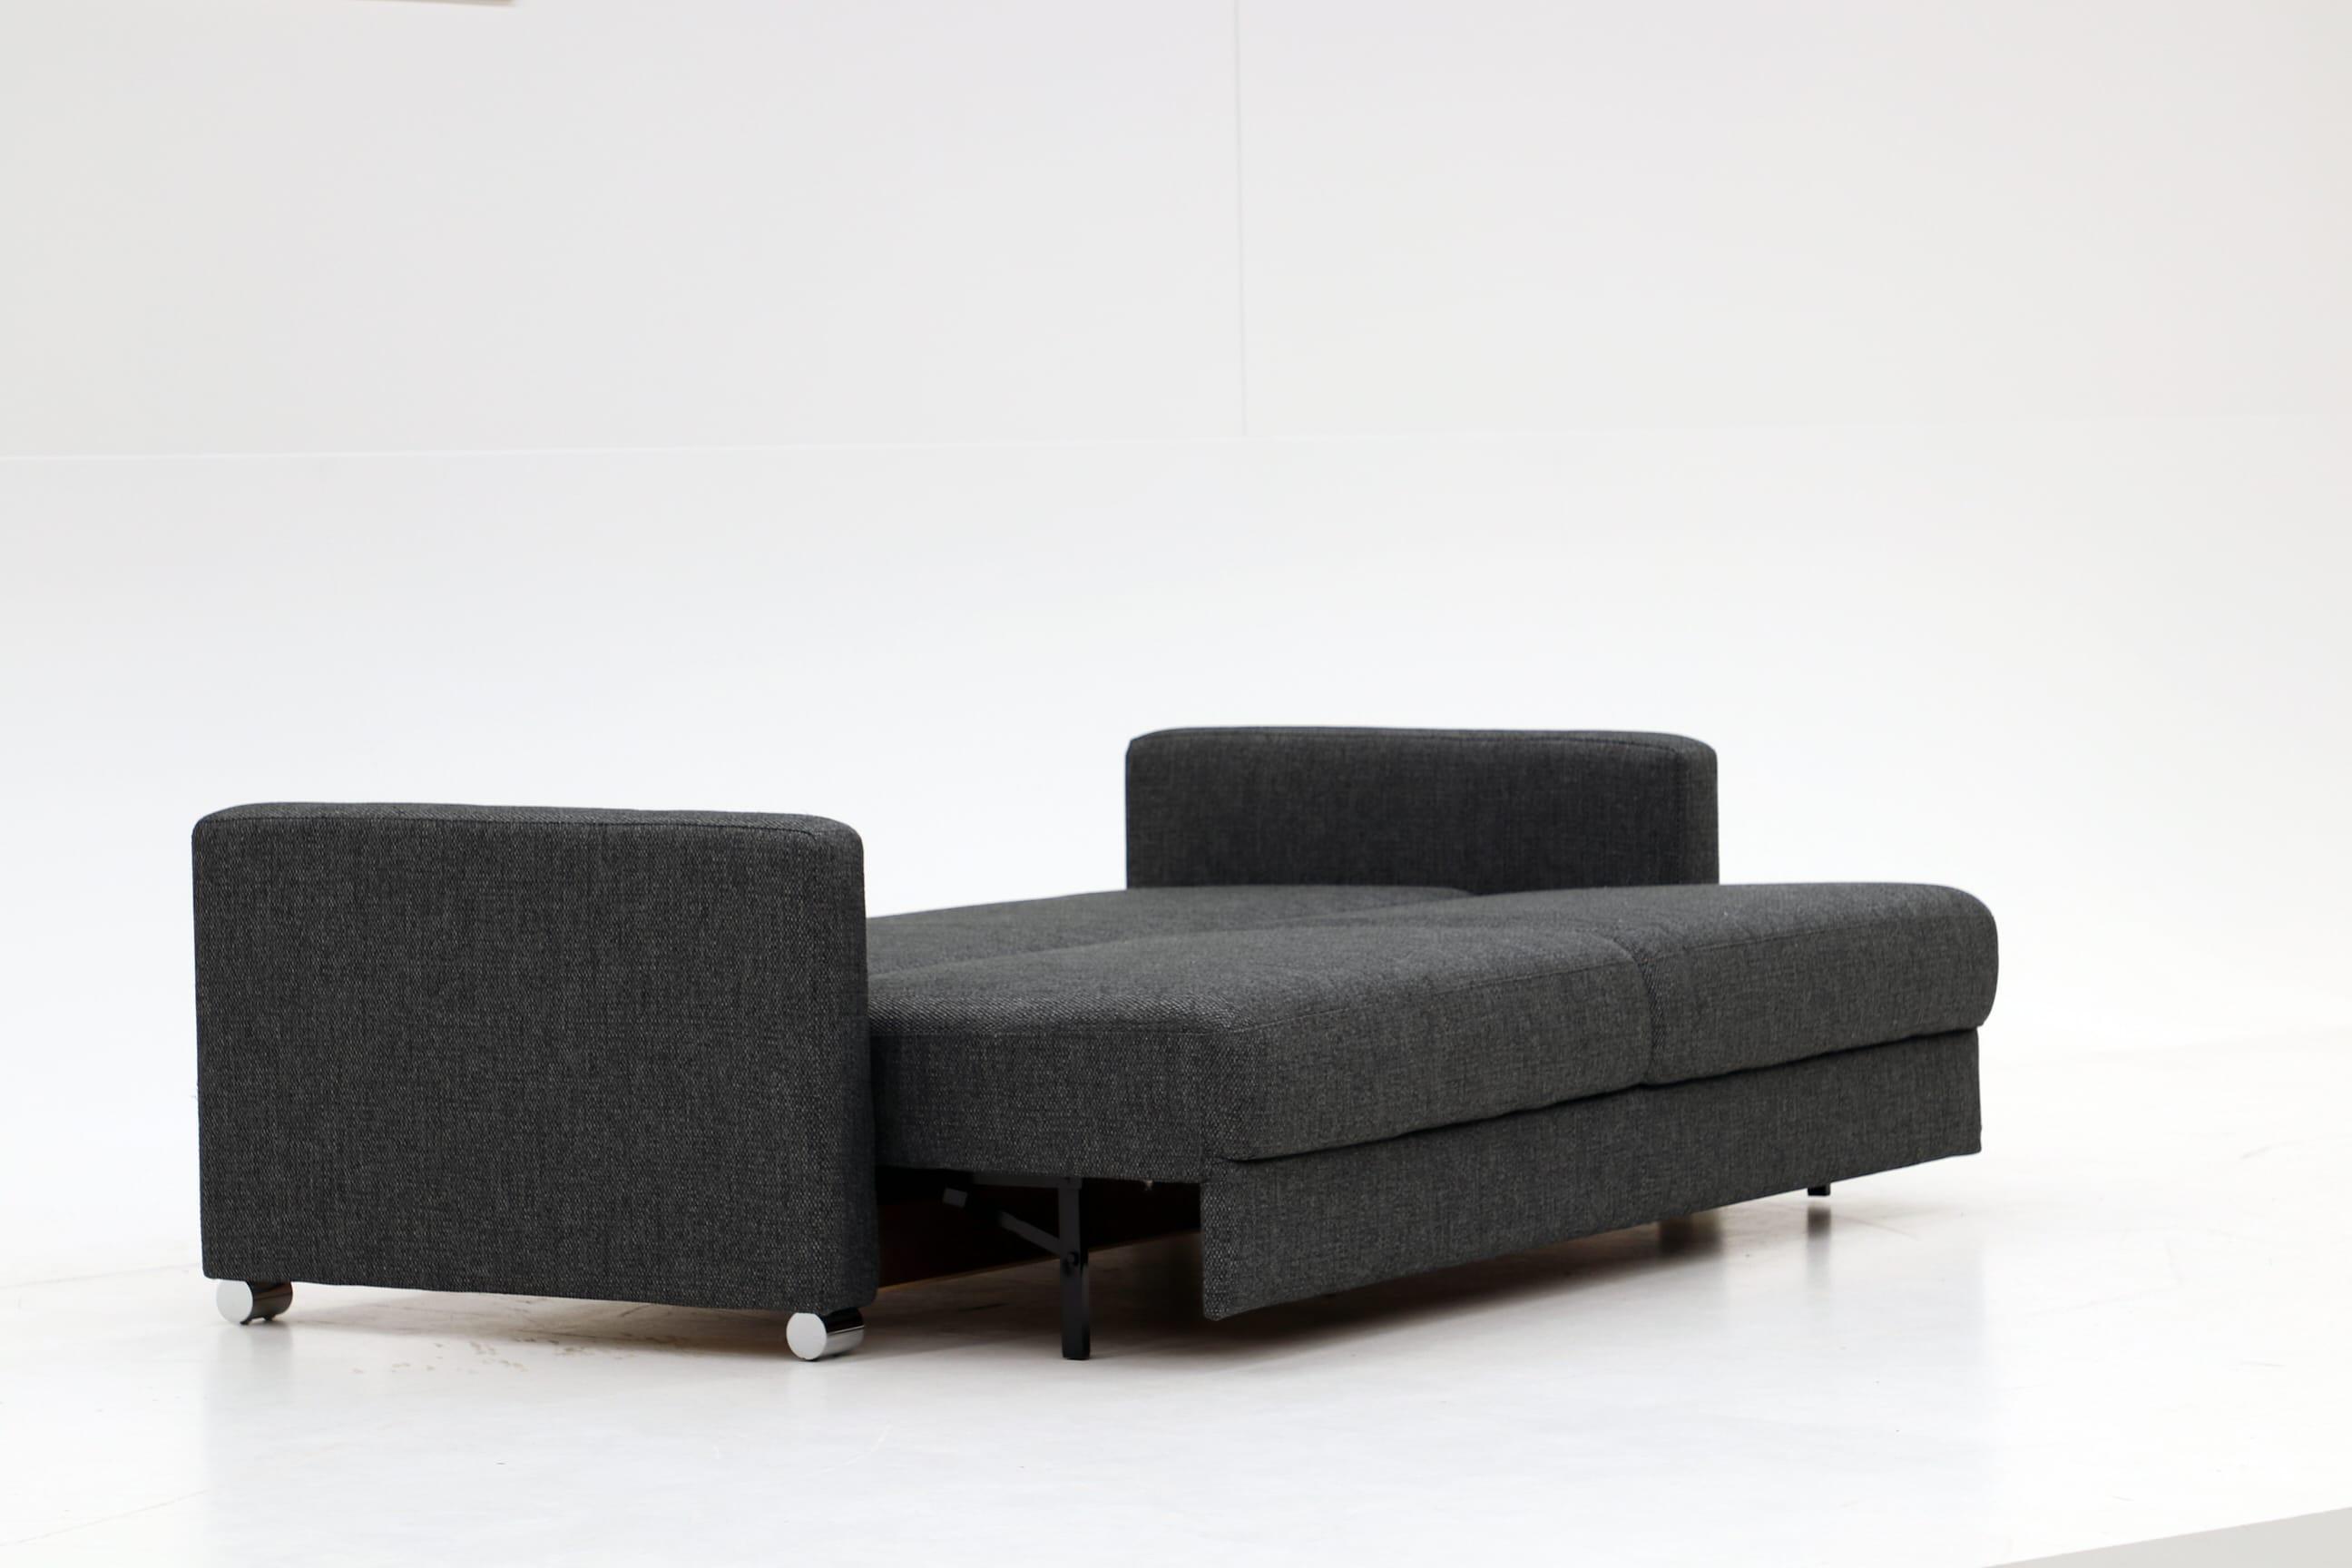 Admirable Fantasy Sofa Sleeper Full Xl Size By Luonto Furniture Spiritservingveterans Wood Chair Design Ideas Spiritservingveteransorg